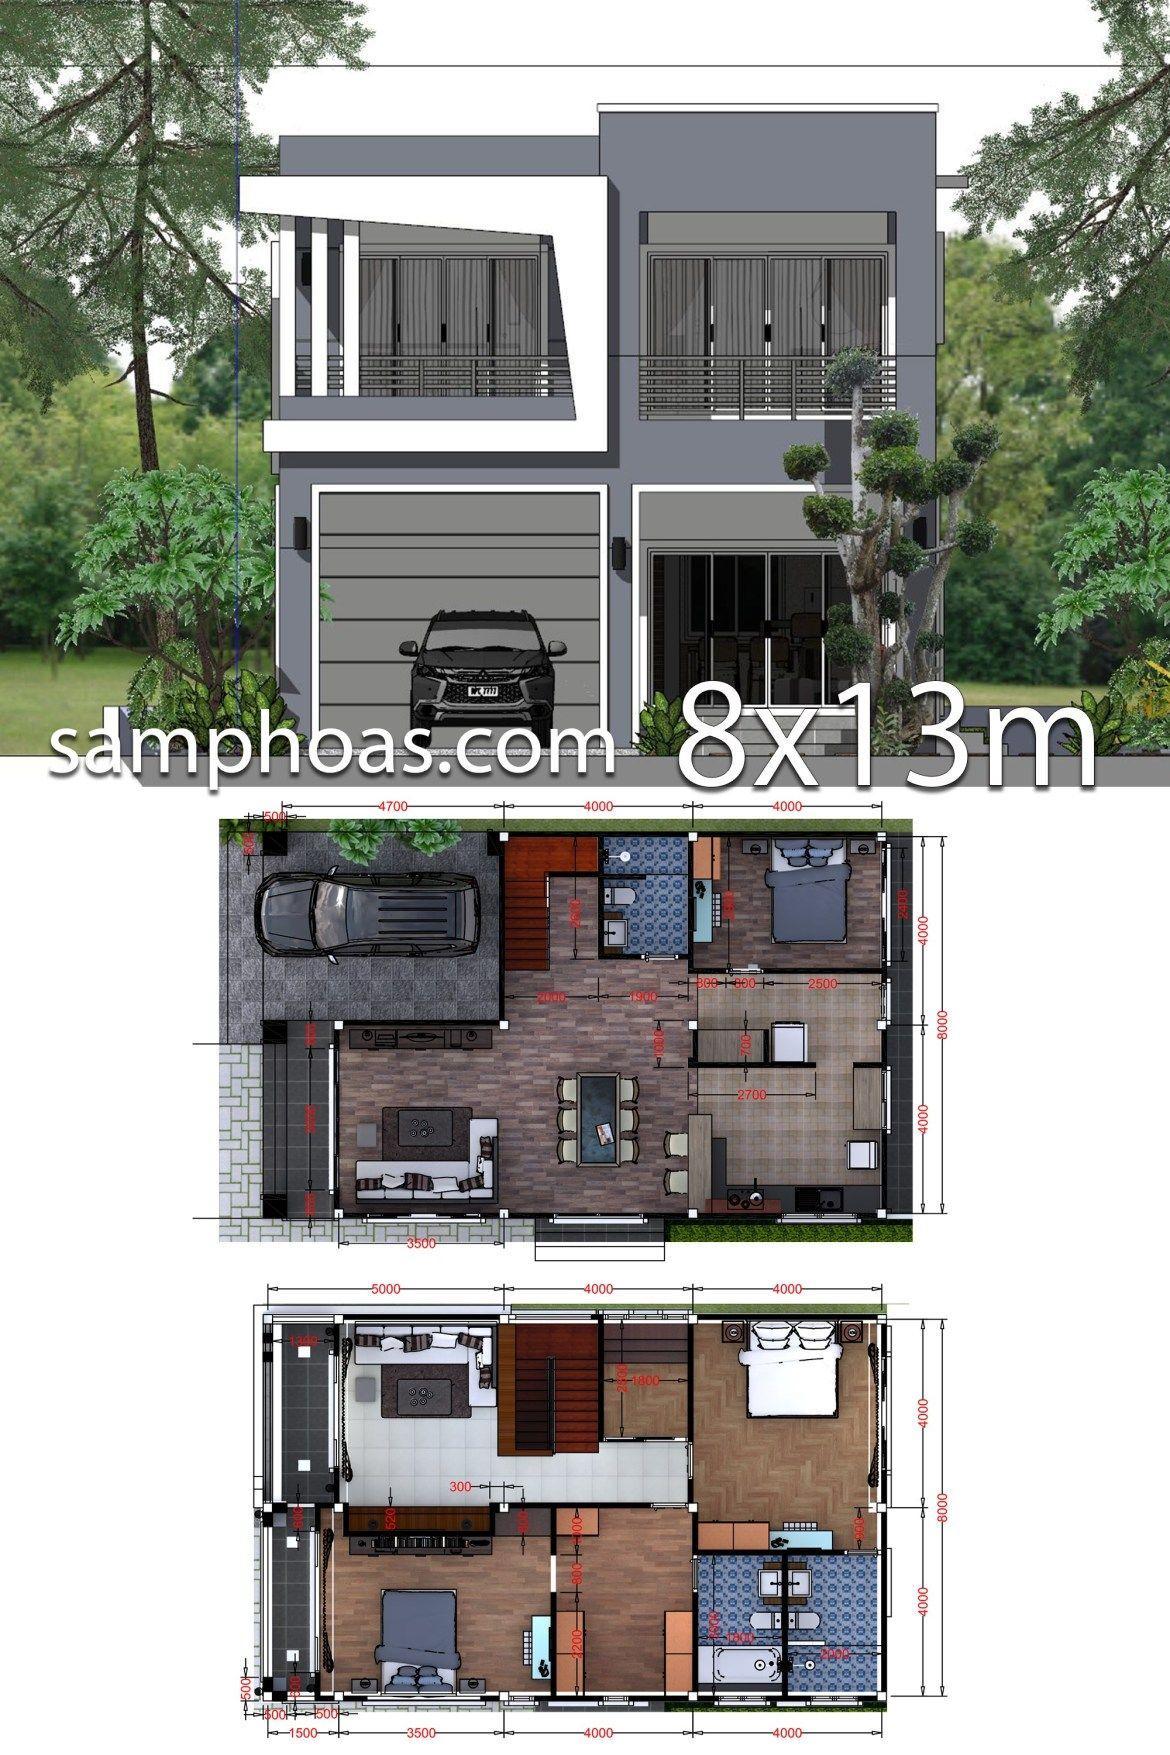 Casa Designer 3d Home Makeover App For Ipad: Plan 3D Interior Design Home Plan 8x13m Full Plan 3Beds